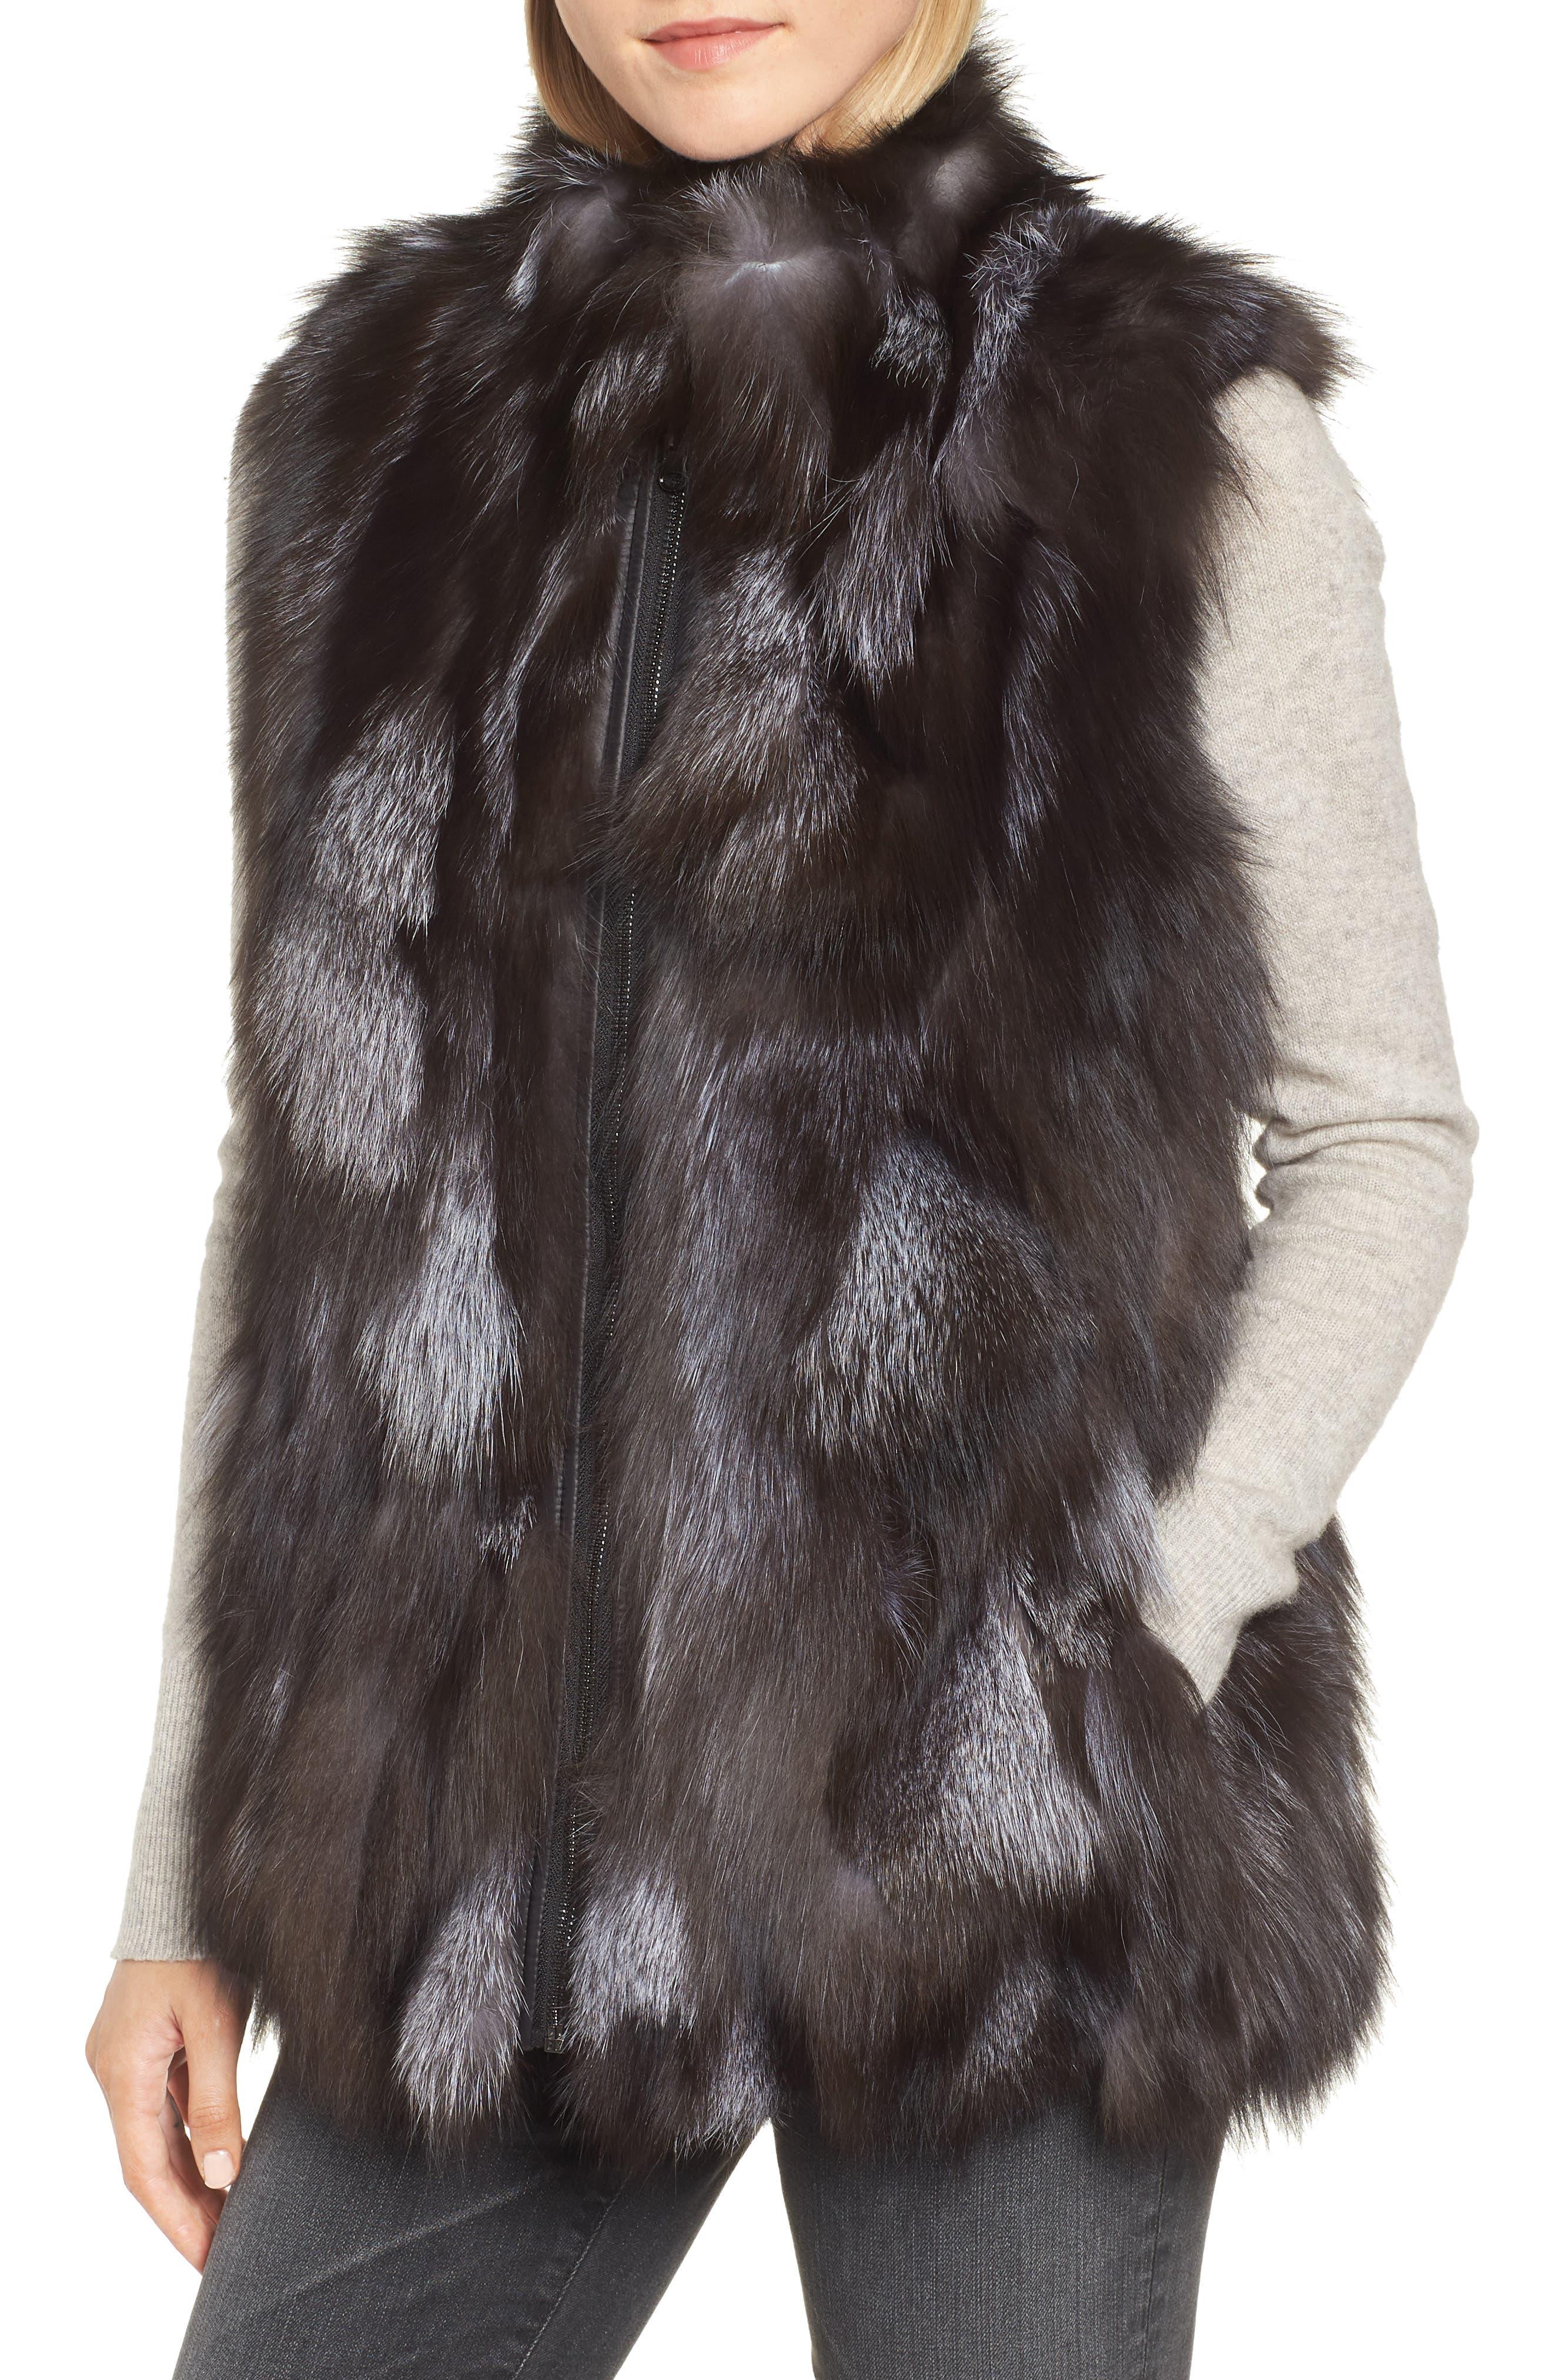 LINDA RICHARDS,                             Reversible Genuine Silver Fox Fur Vest,                             Alternate thumbnail 2, color,                             BLACK/ SILVER